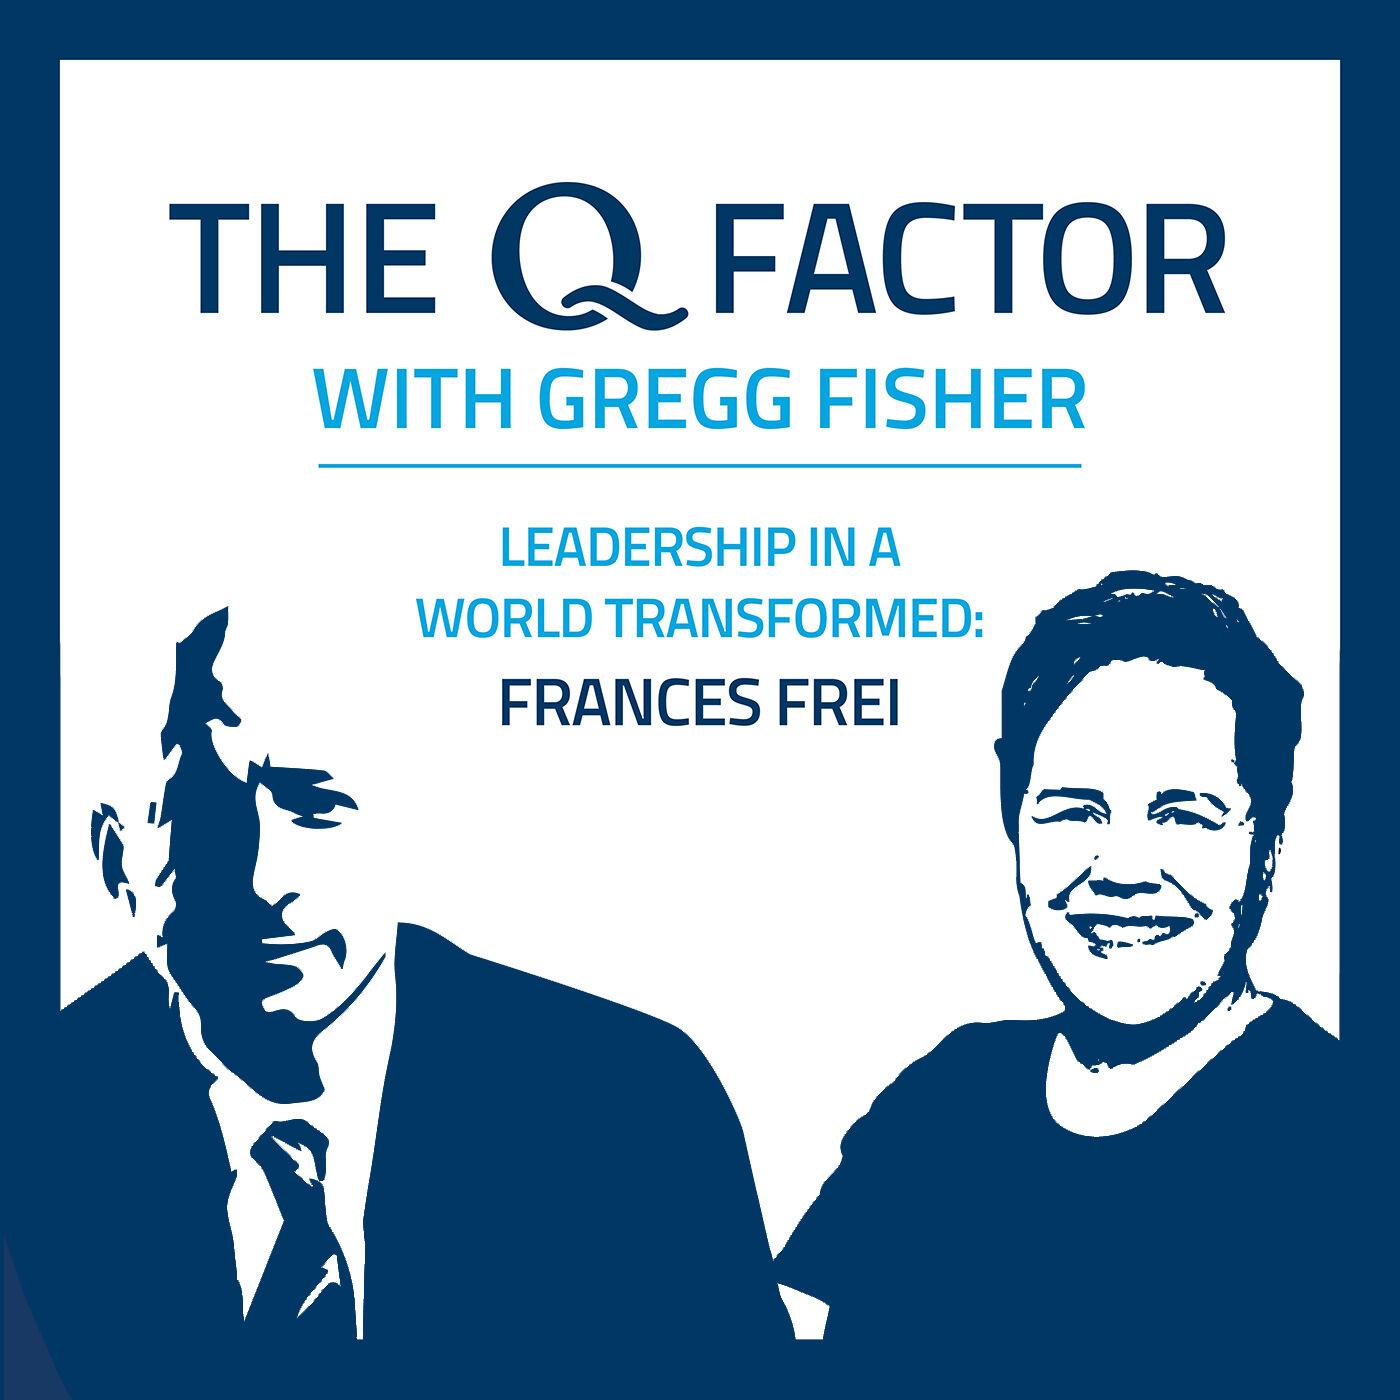 FRANCES FREI: LEADERSHIP IN A WORLD TRANSFORMED